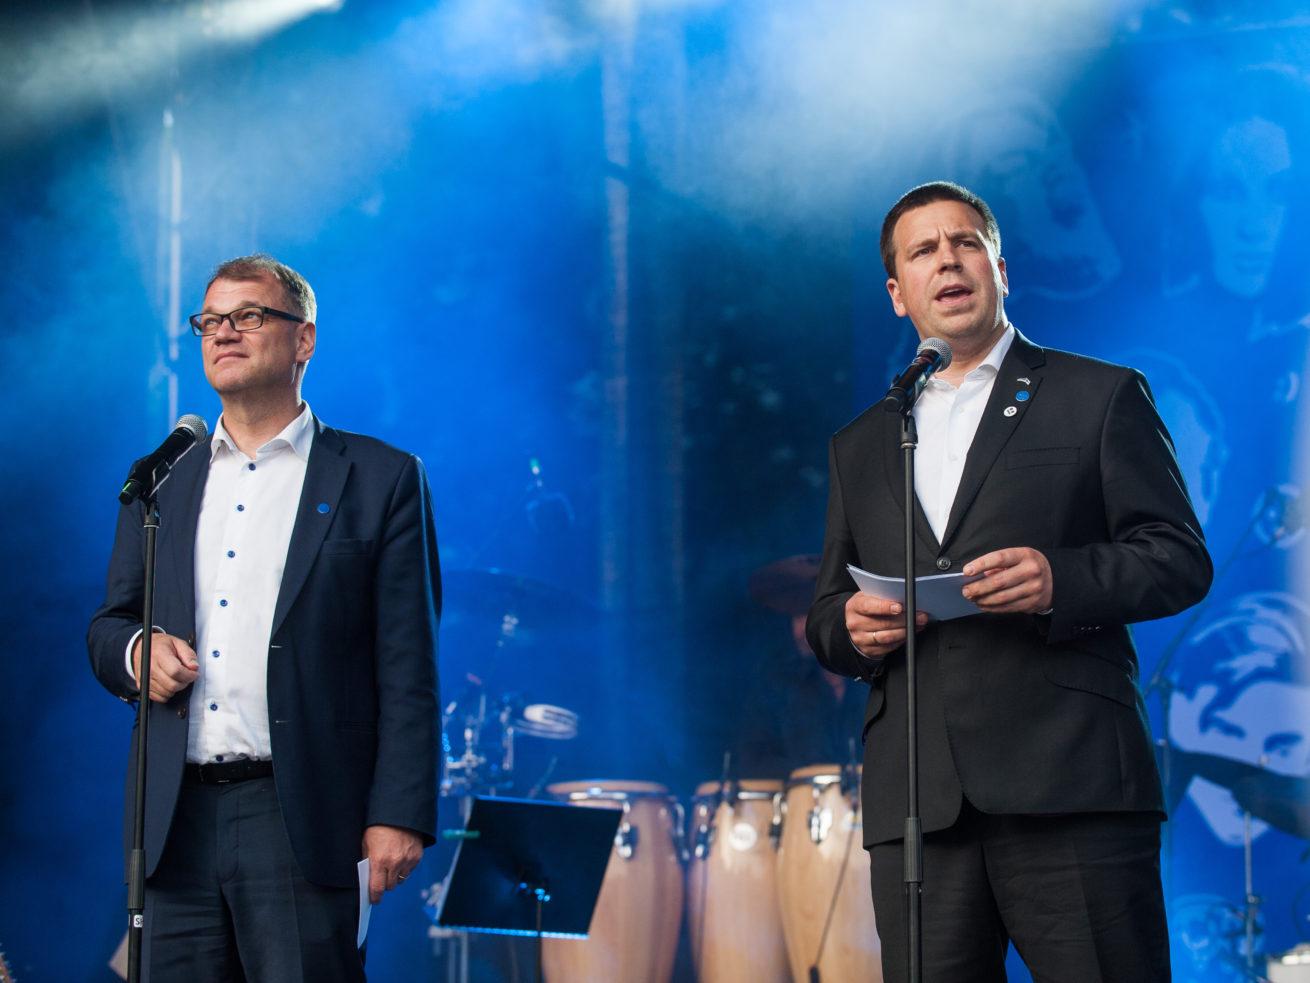 Juha Sipilä ja Jüri Ratas